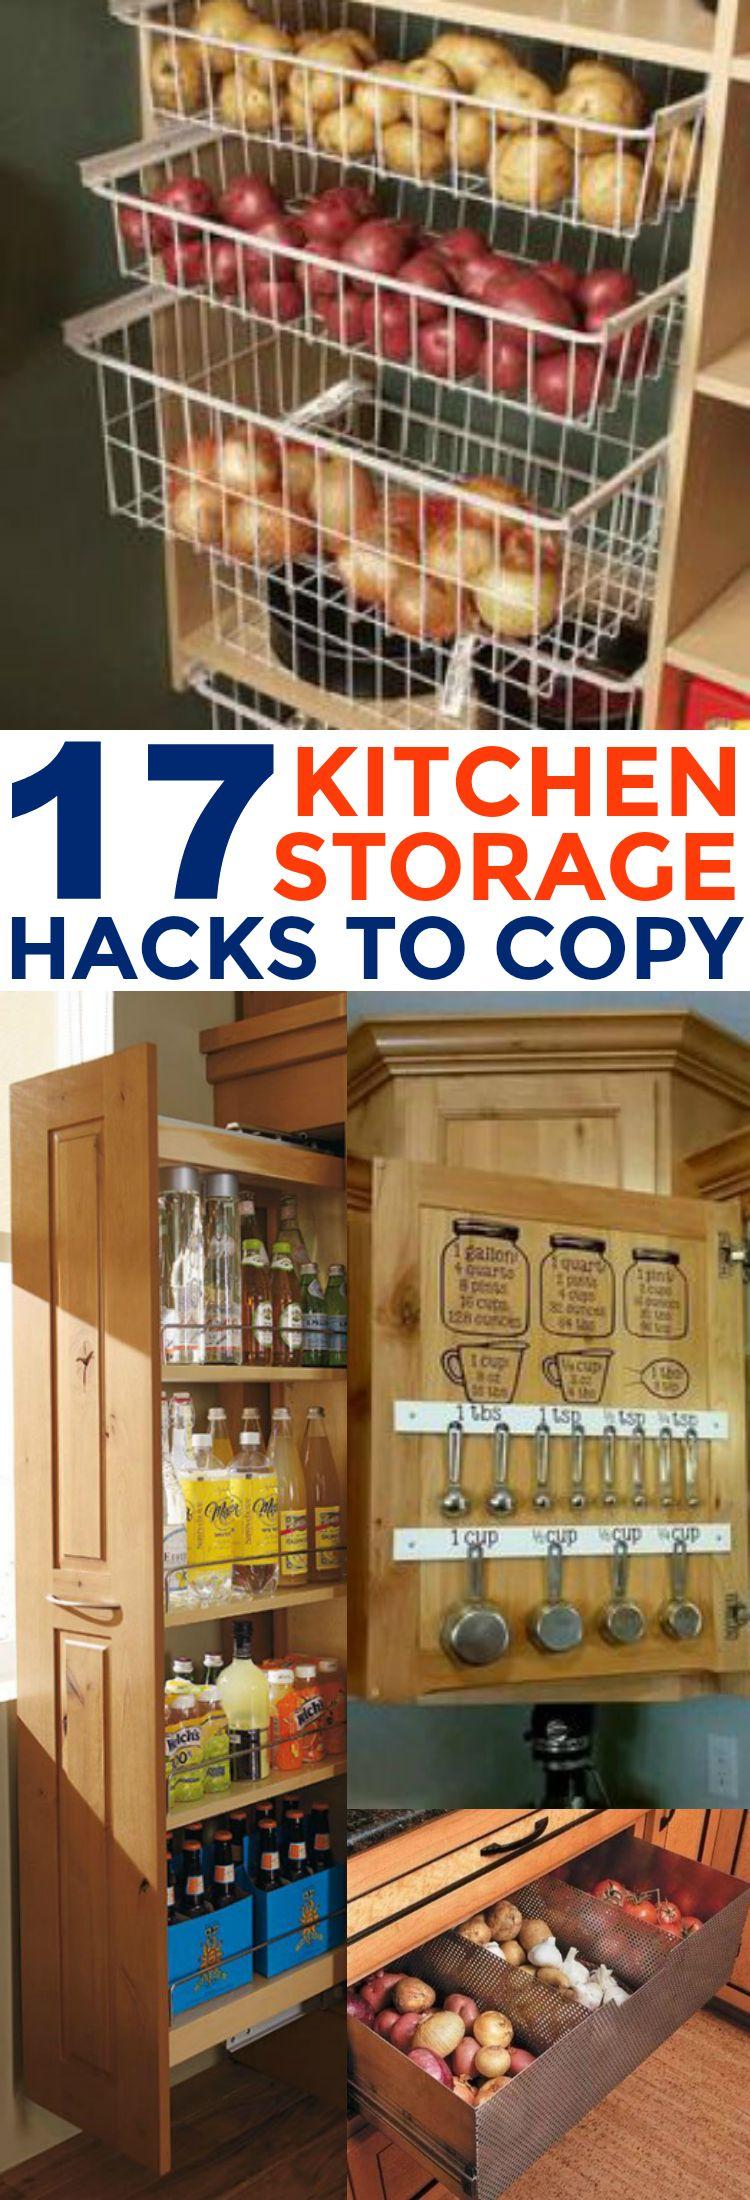 Kitchen Cabinet Organization: 17 Hacks to Start Organizing ...